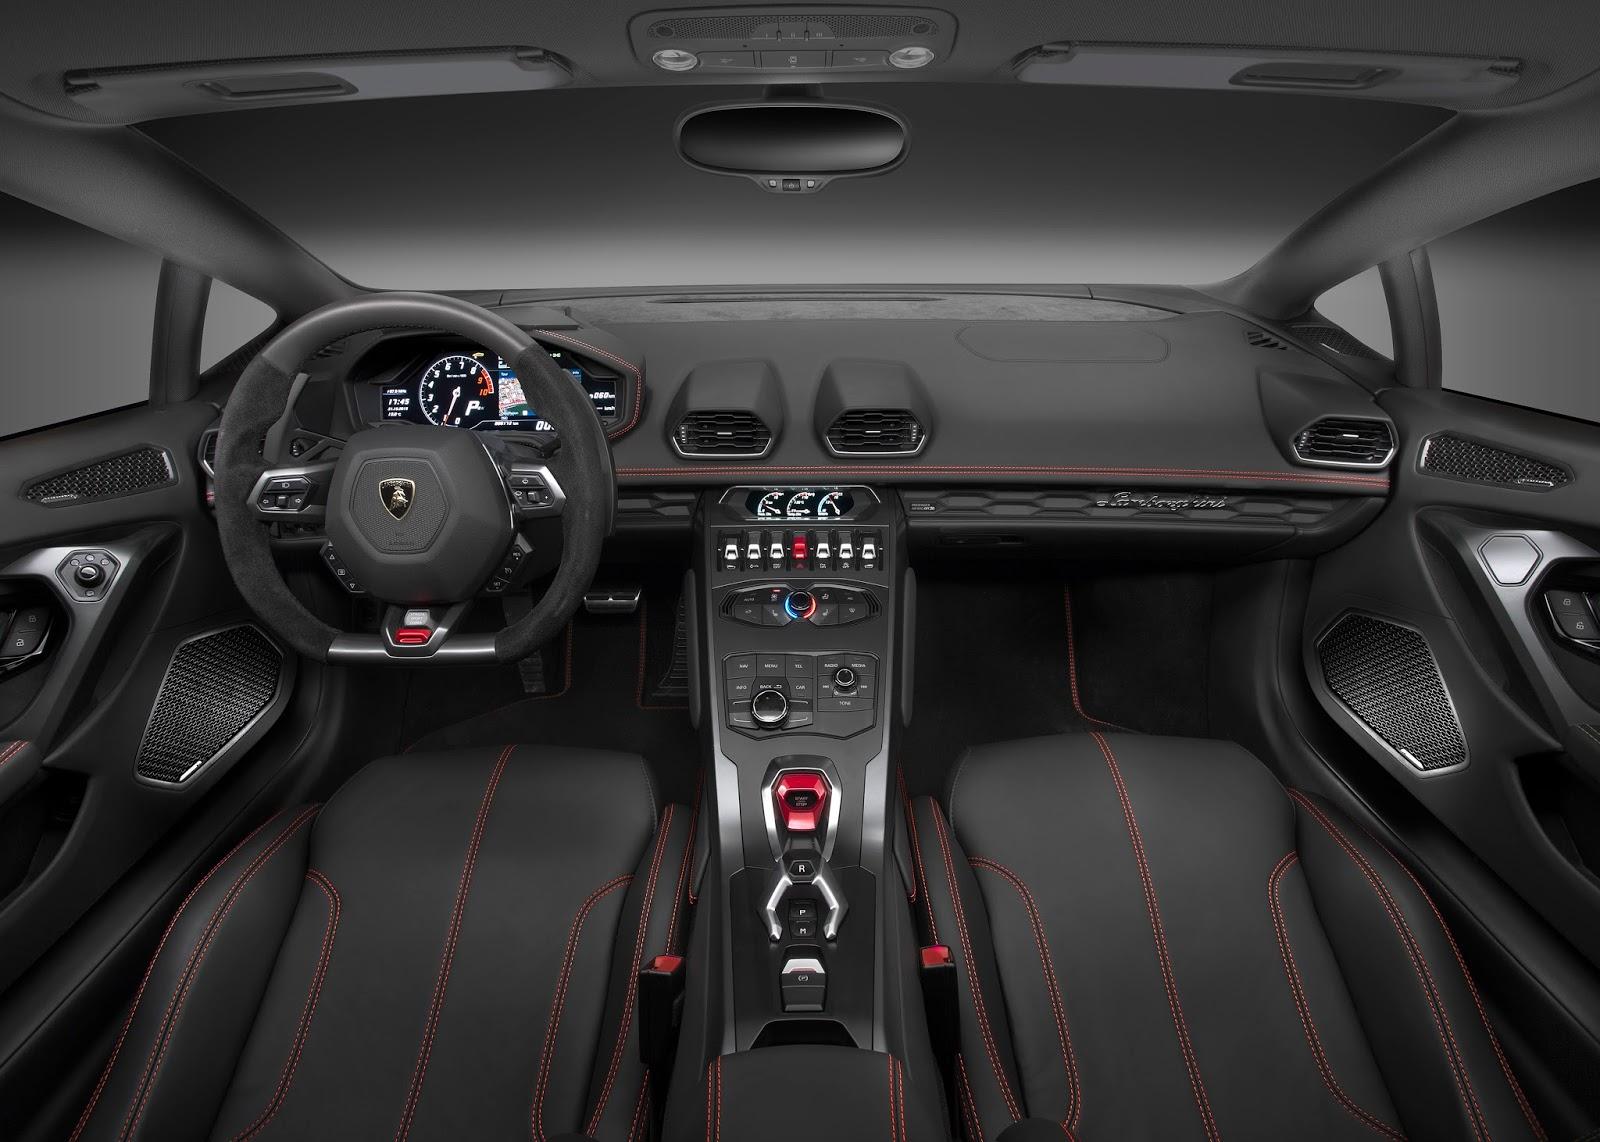 409538 Lamborghini Huracan LP580-2 : Η πιο fun to drive Lamborghini είναι πισωκίνητη και η φθηνότερη Lamborghini, Lamborghini Huracan, Lamborghini Huracan LP580-2, supercars, videos